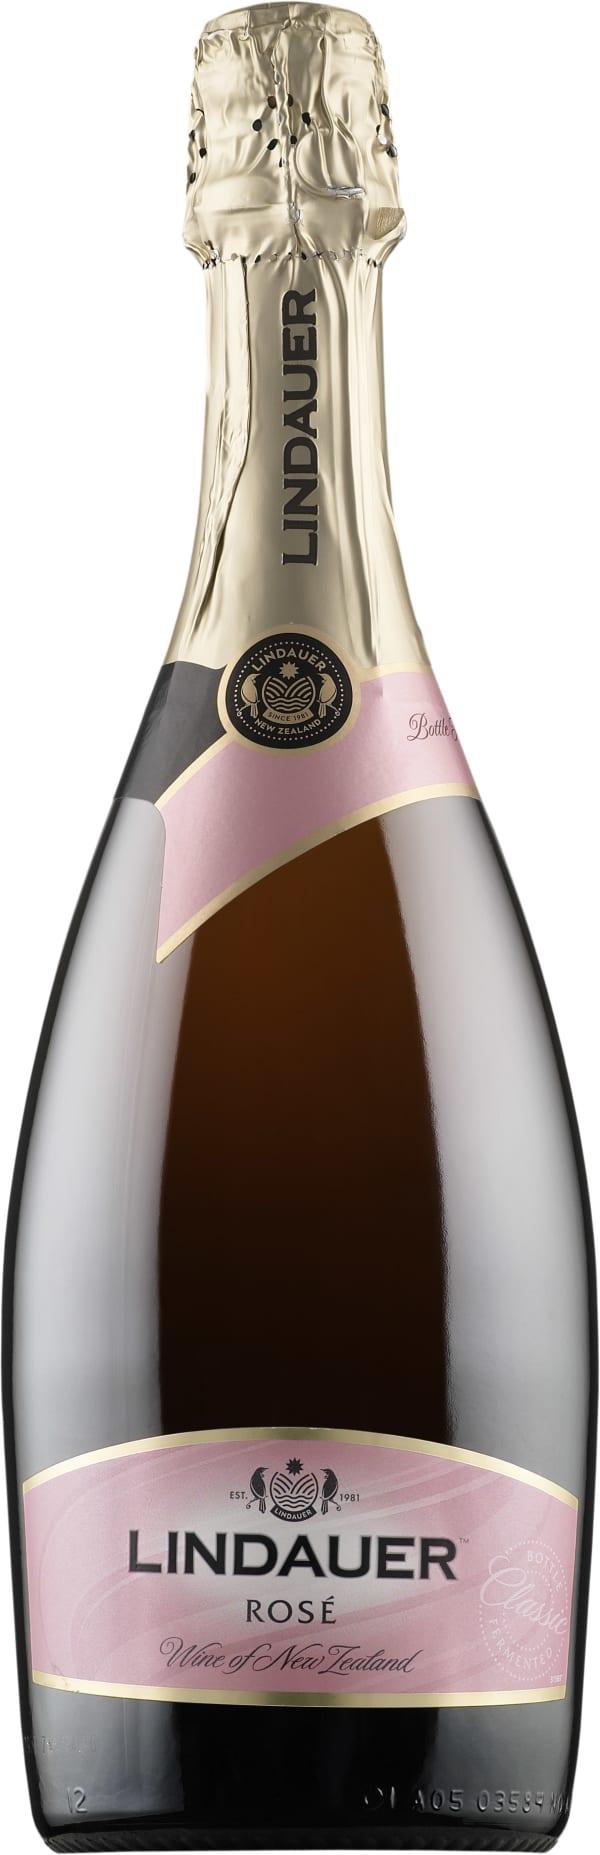 Lindauer Rosé Brut